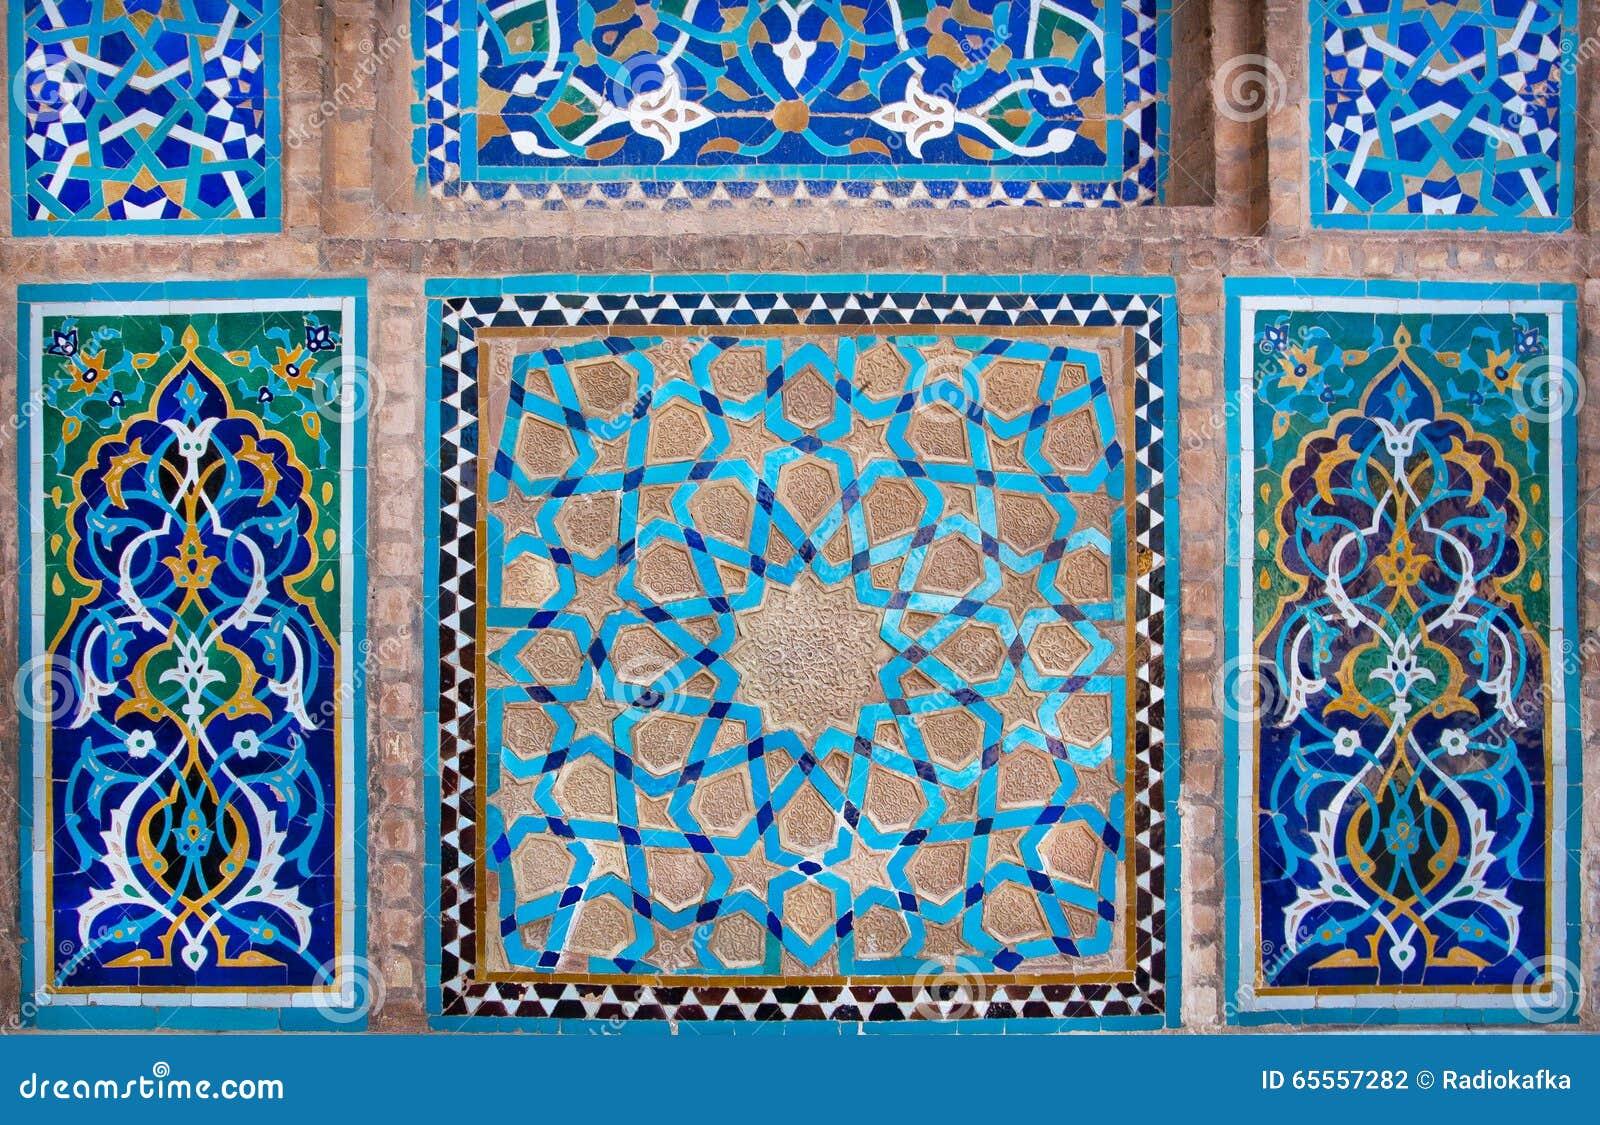 Fantastic 1 Inch Hexagon Floor Tiles Huge 12X12 Floor Tiles Flat 12X24 Ceramic Tile Patterns 2 X 12 Ceramic Tile Old 2X6 Subway Tile Yellow3D Ceiling Tiles Antique Ceramic Tiles   Columbialabels